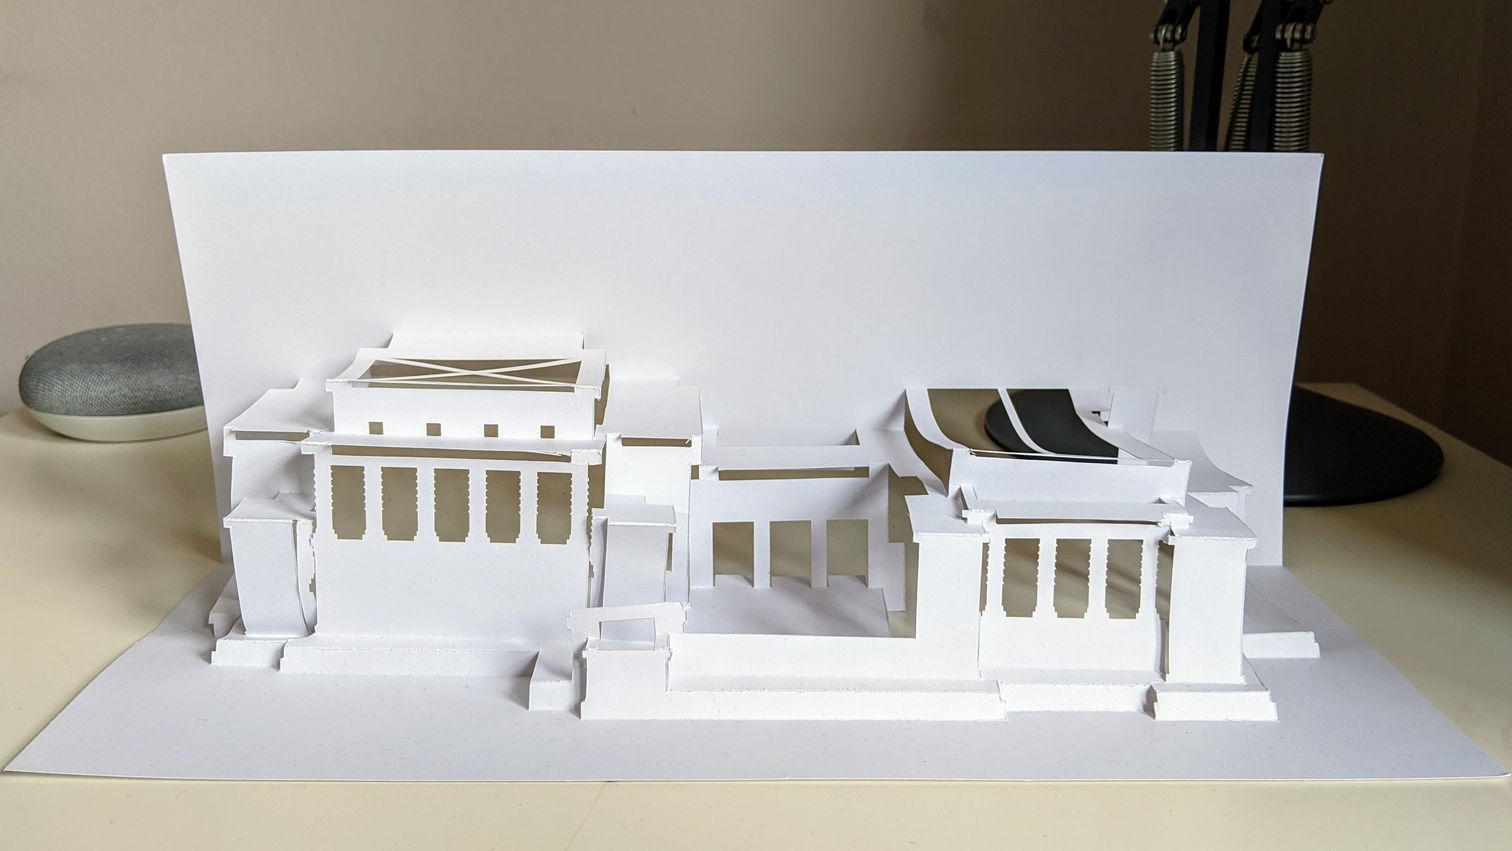 Kirigami model of Imperial Hotel